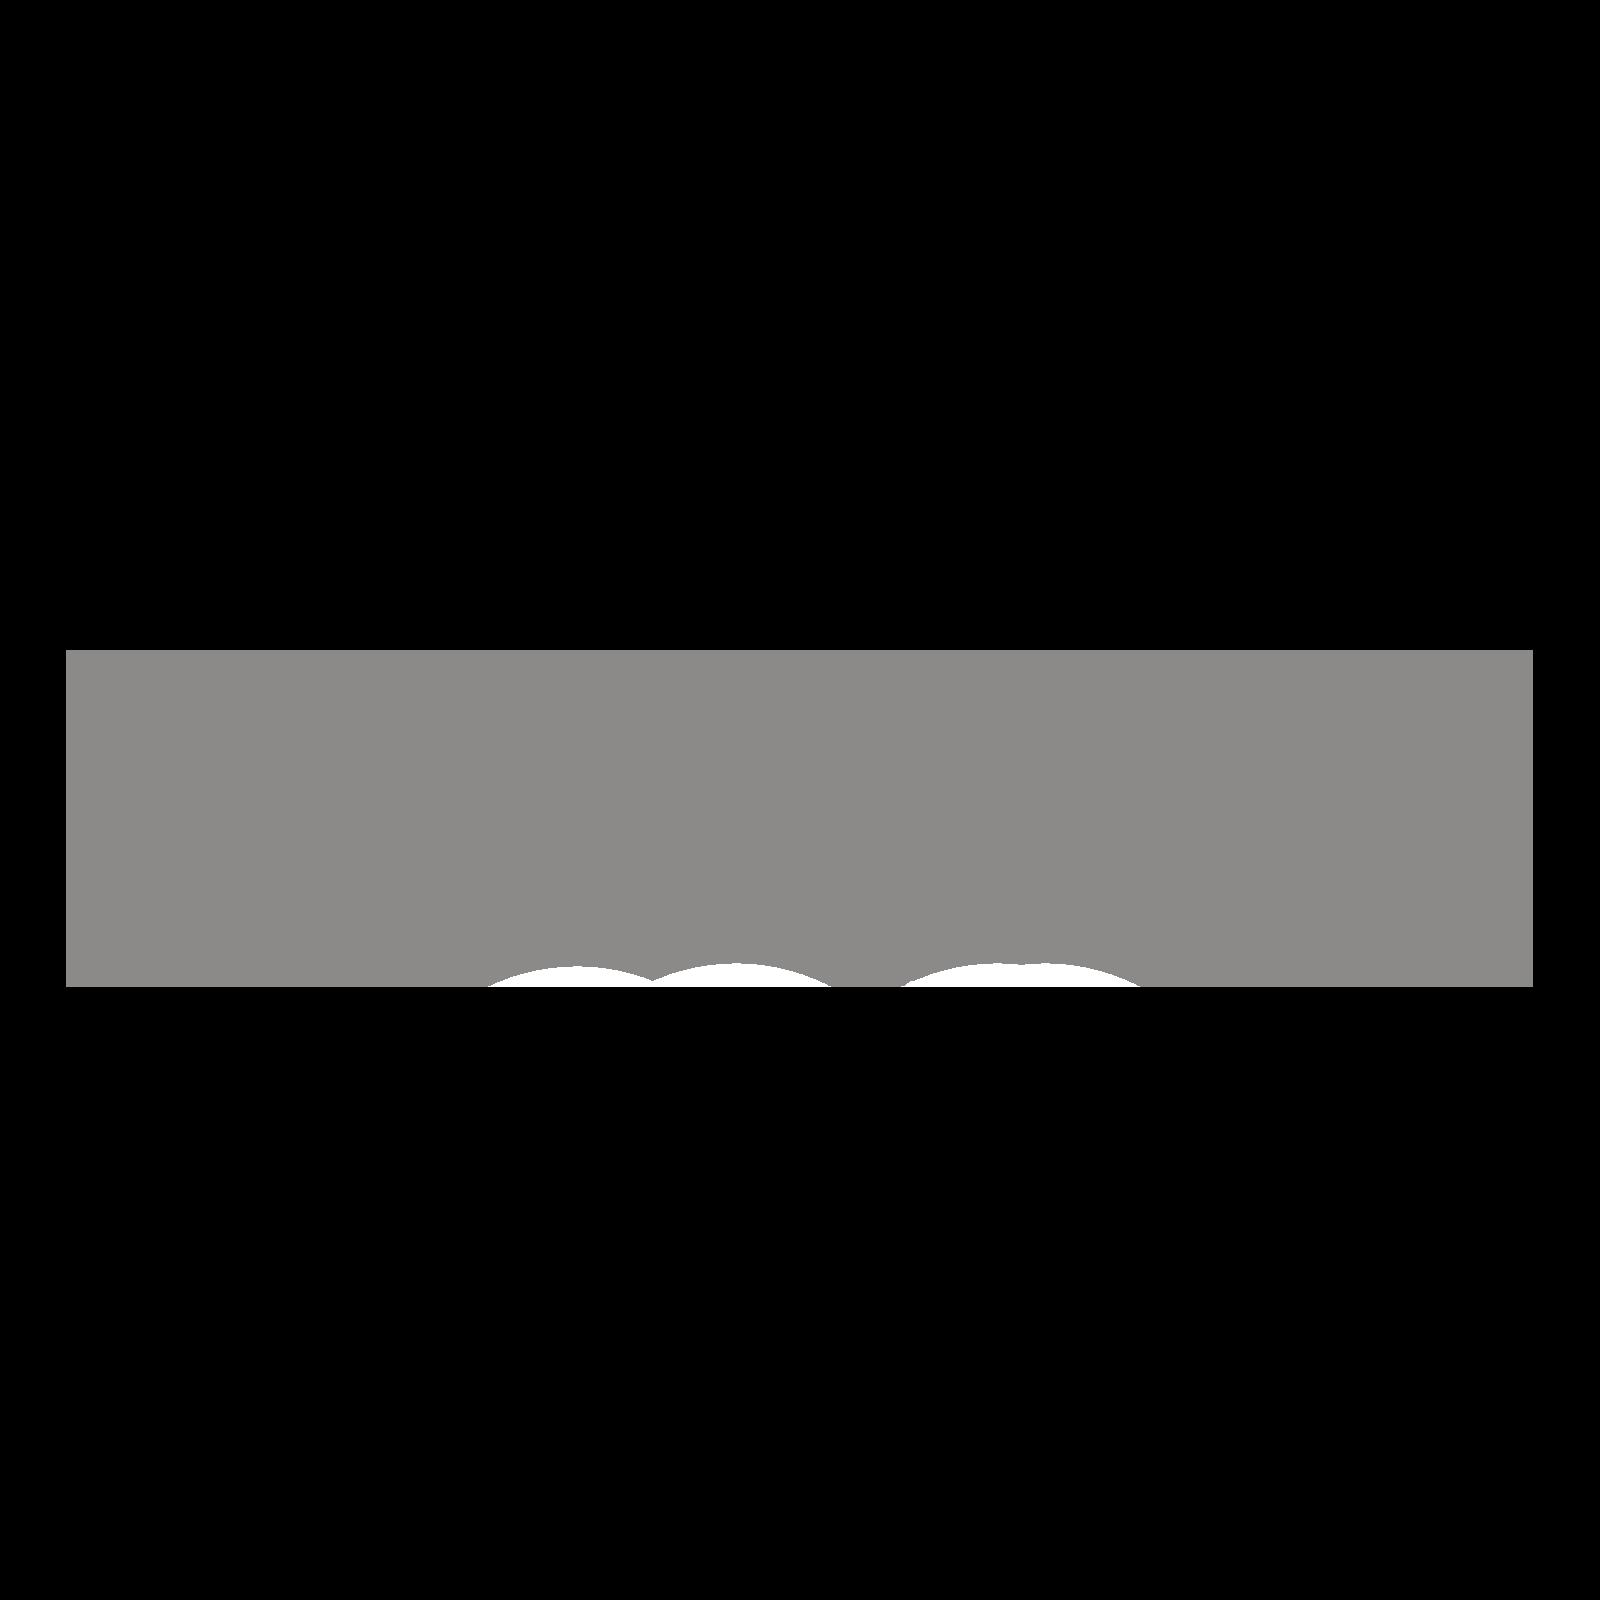 Nkassi